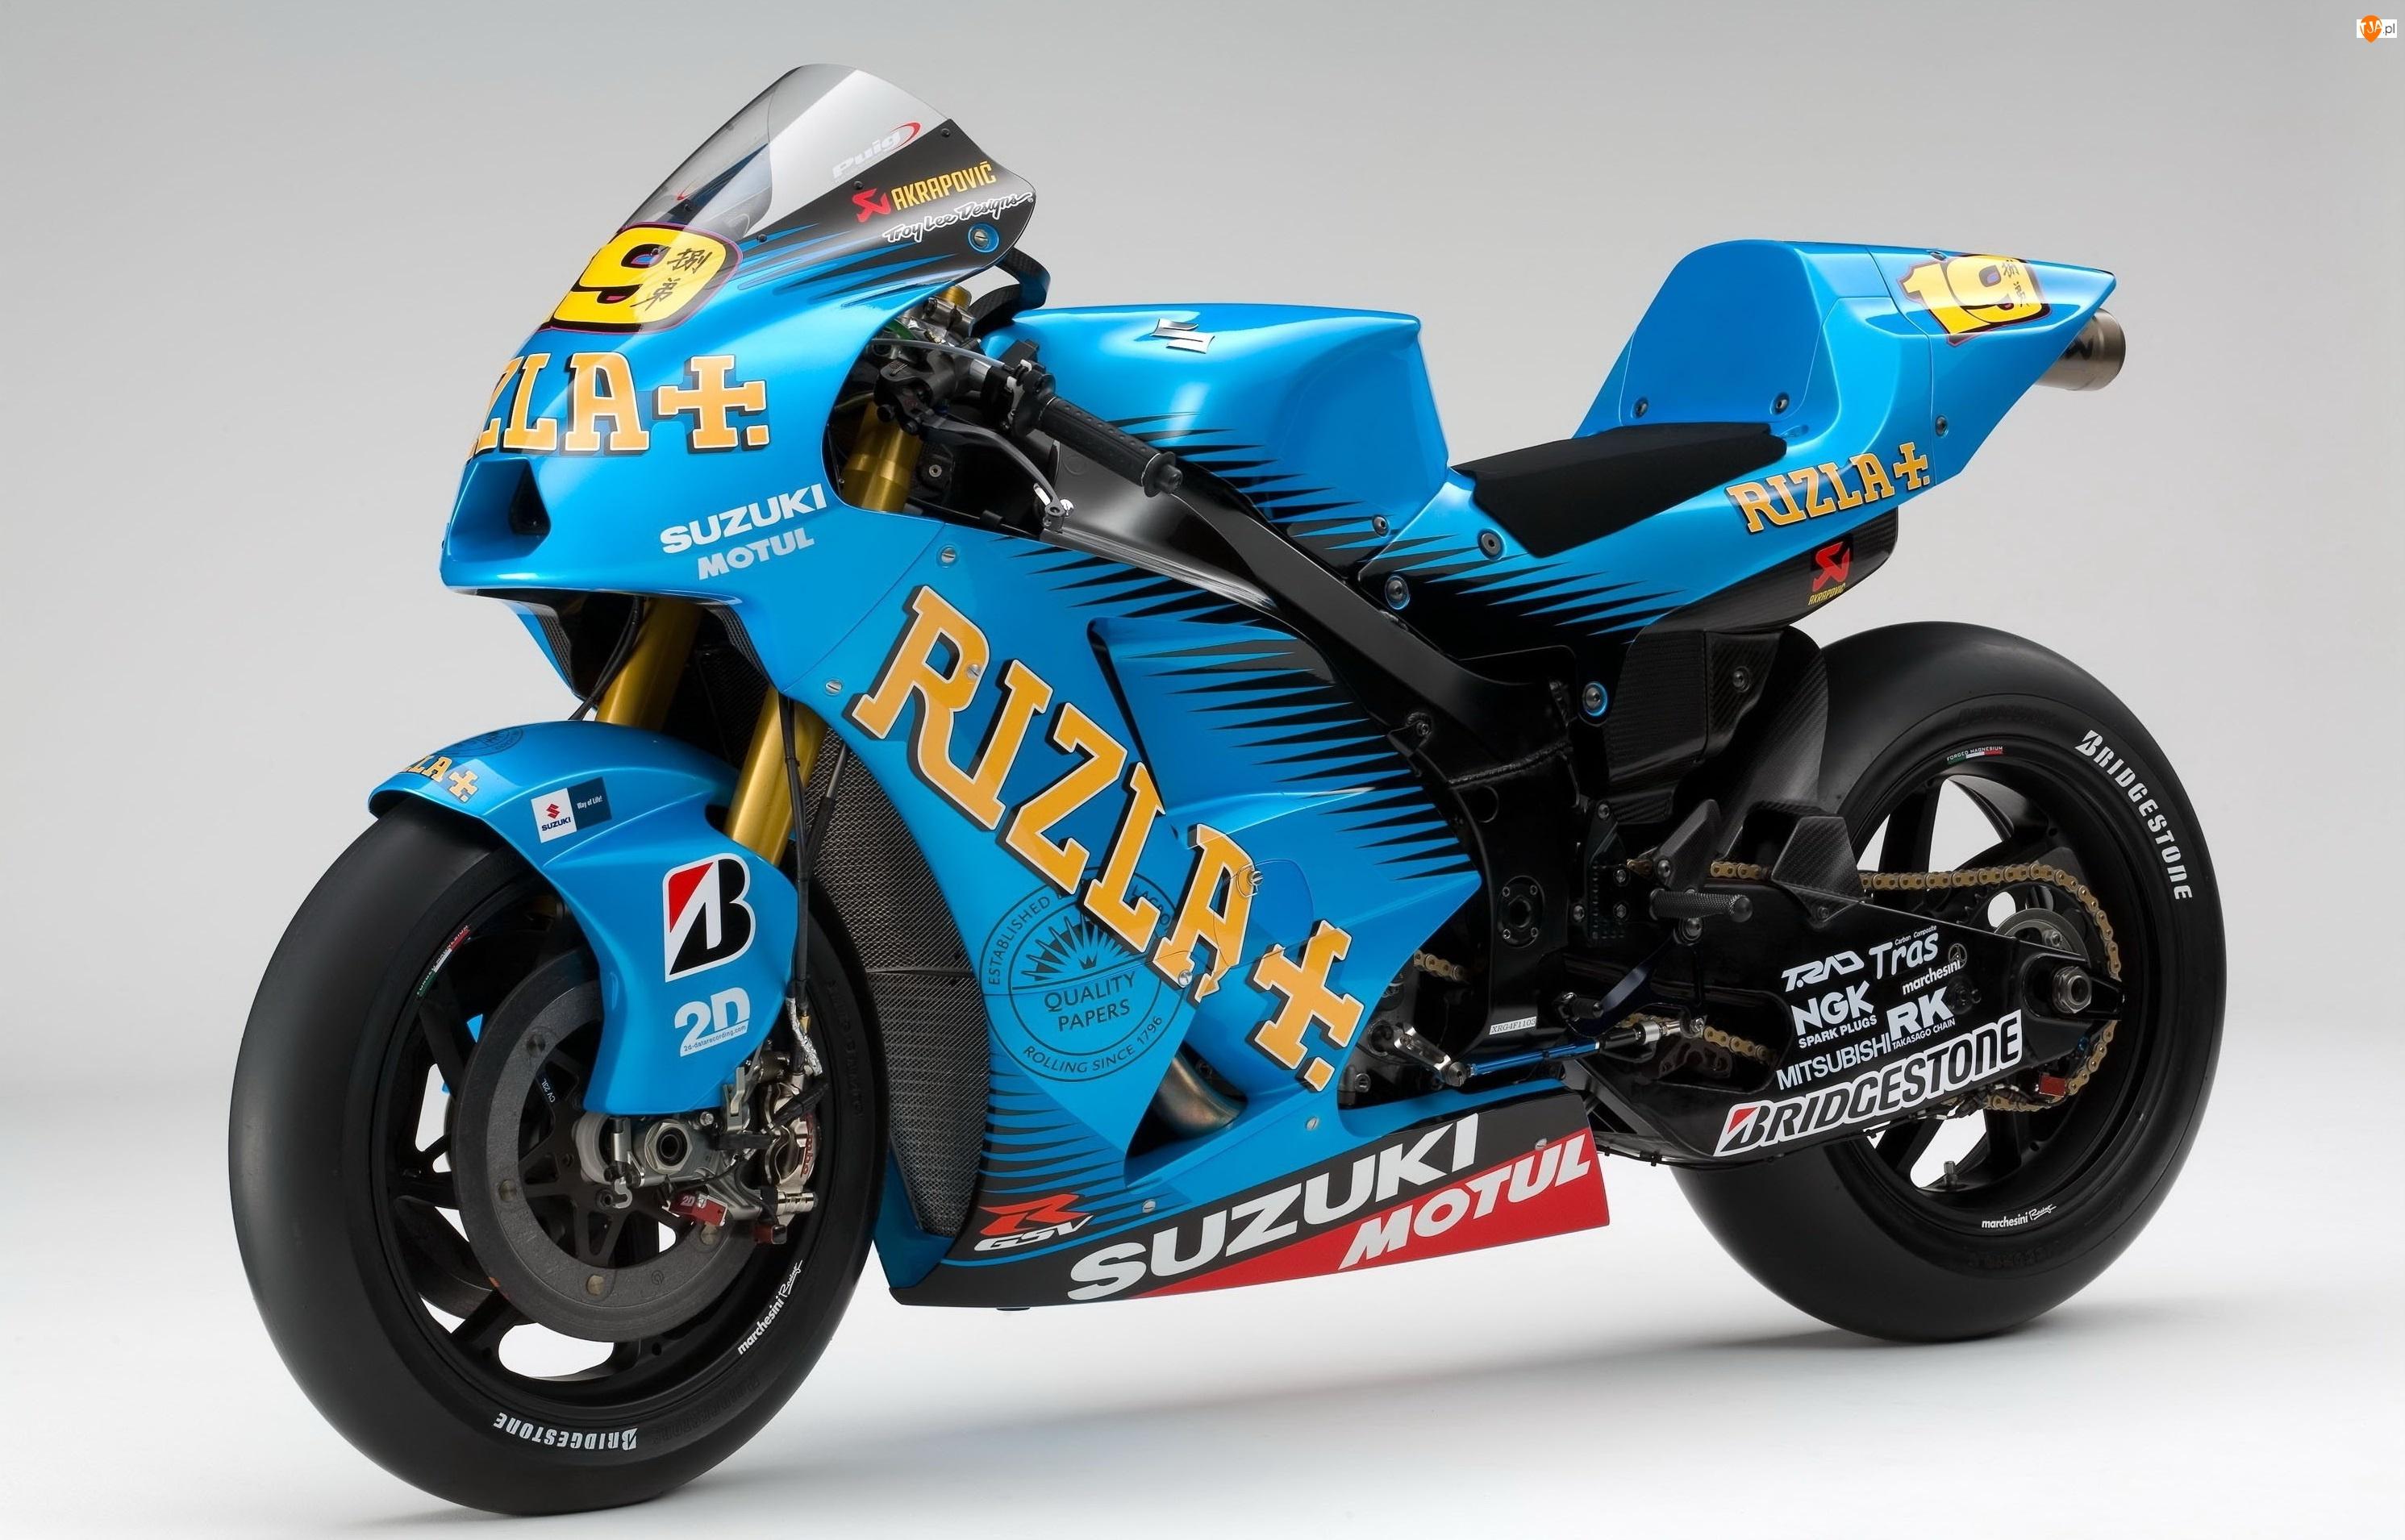 Motocykl, Suzuki